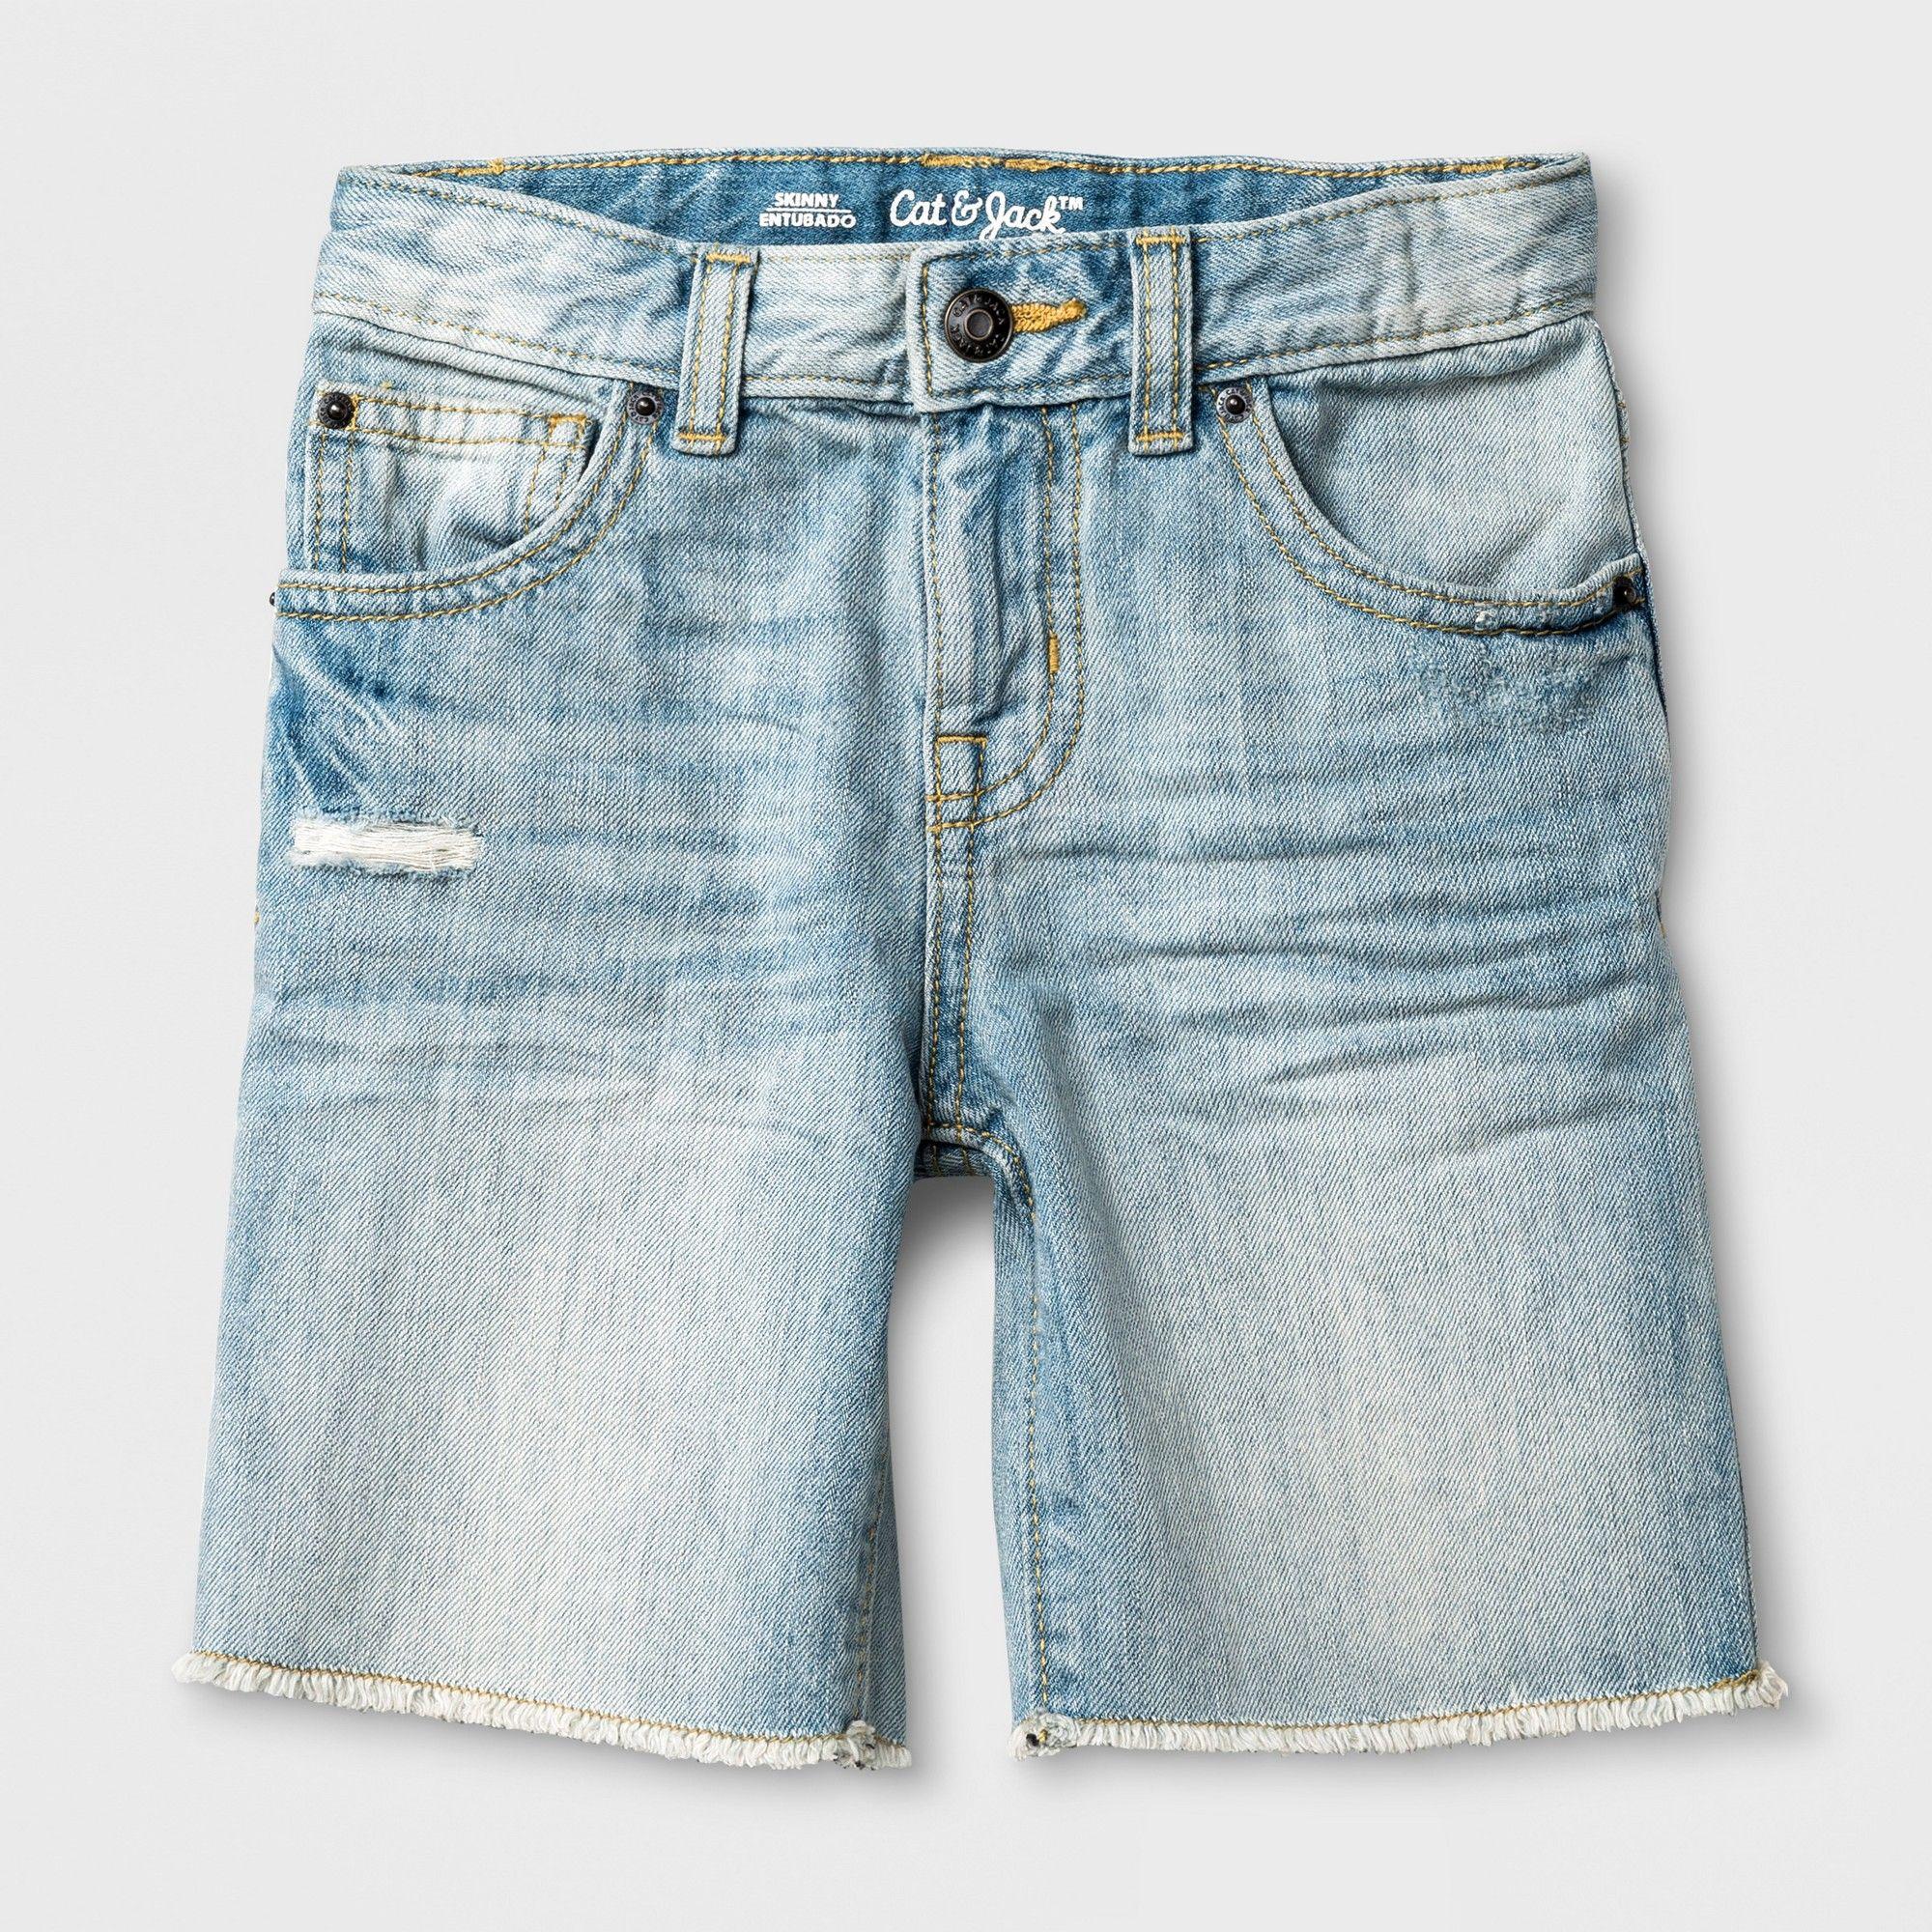 NEW Circo Toddler Boys Denim Jean Shorts